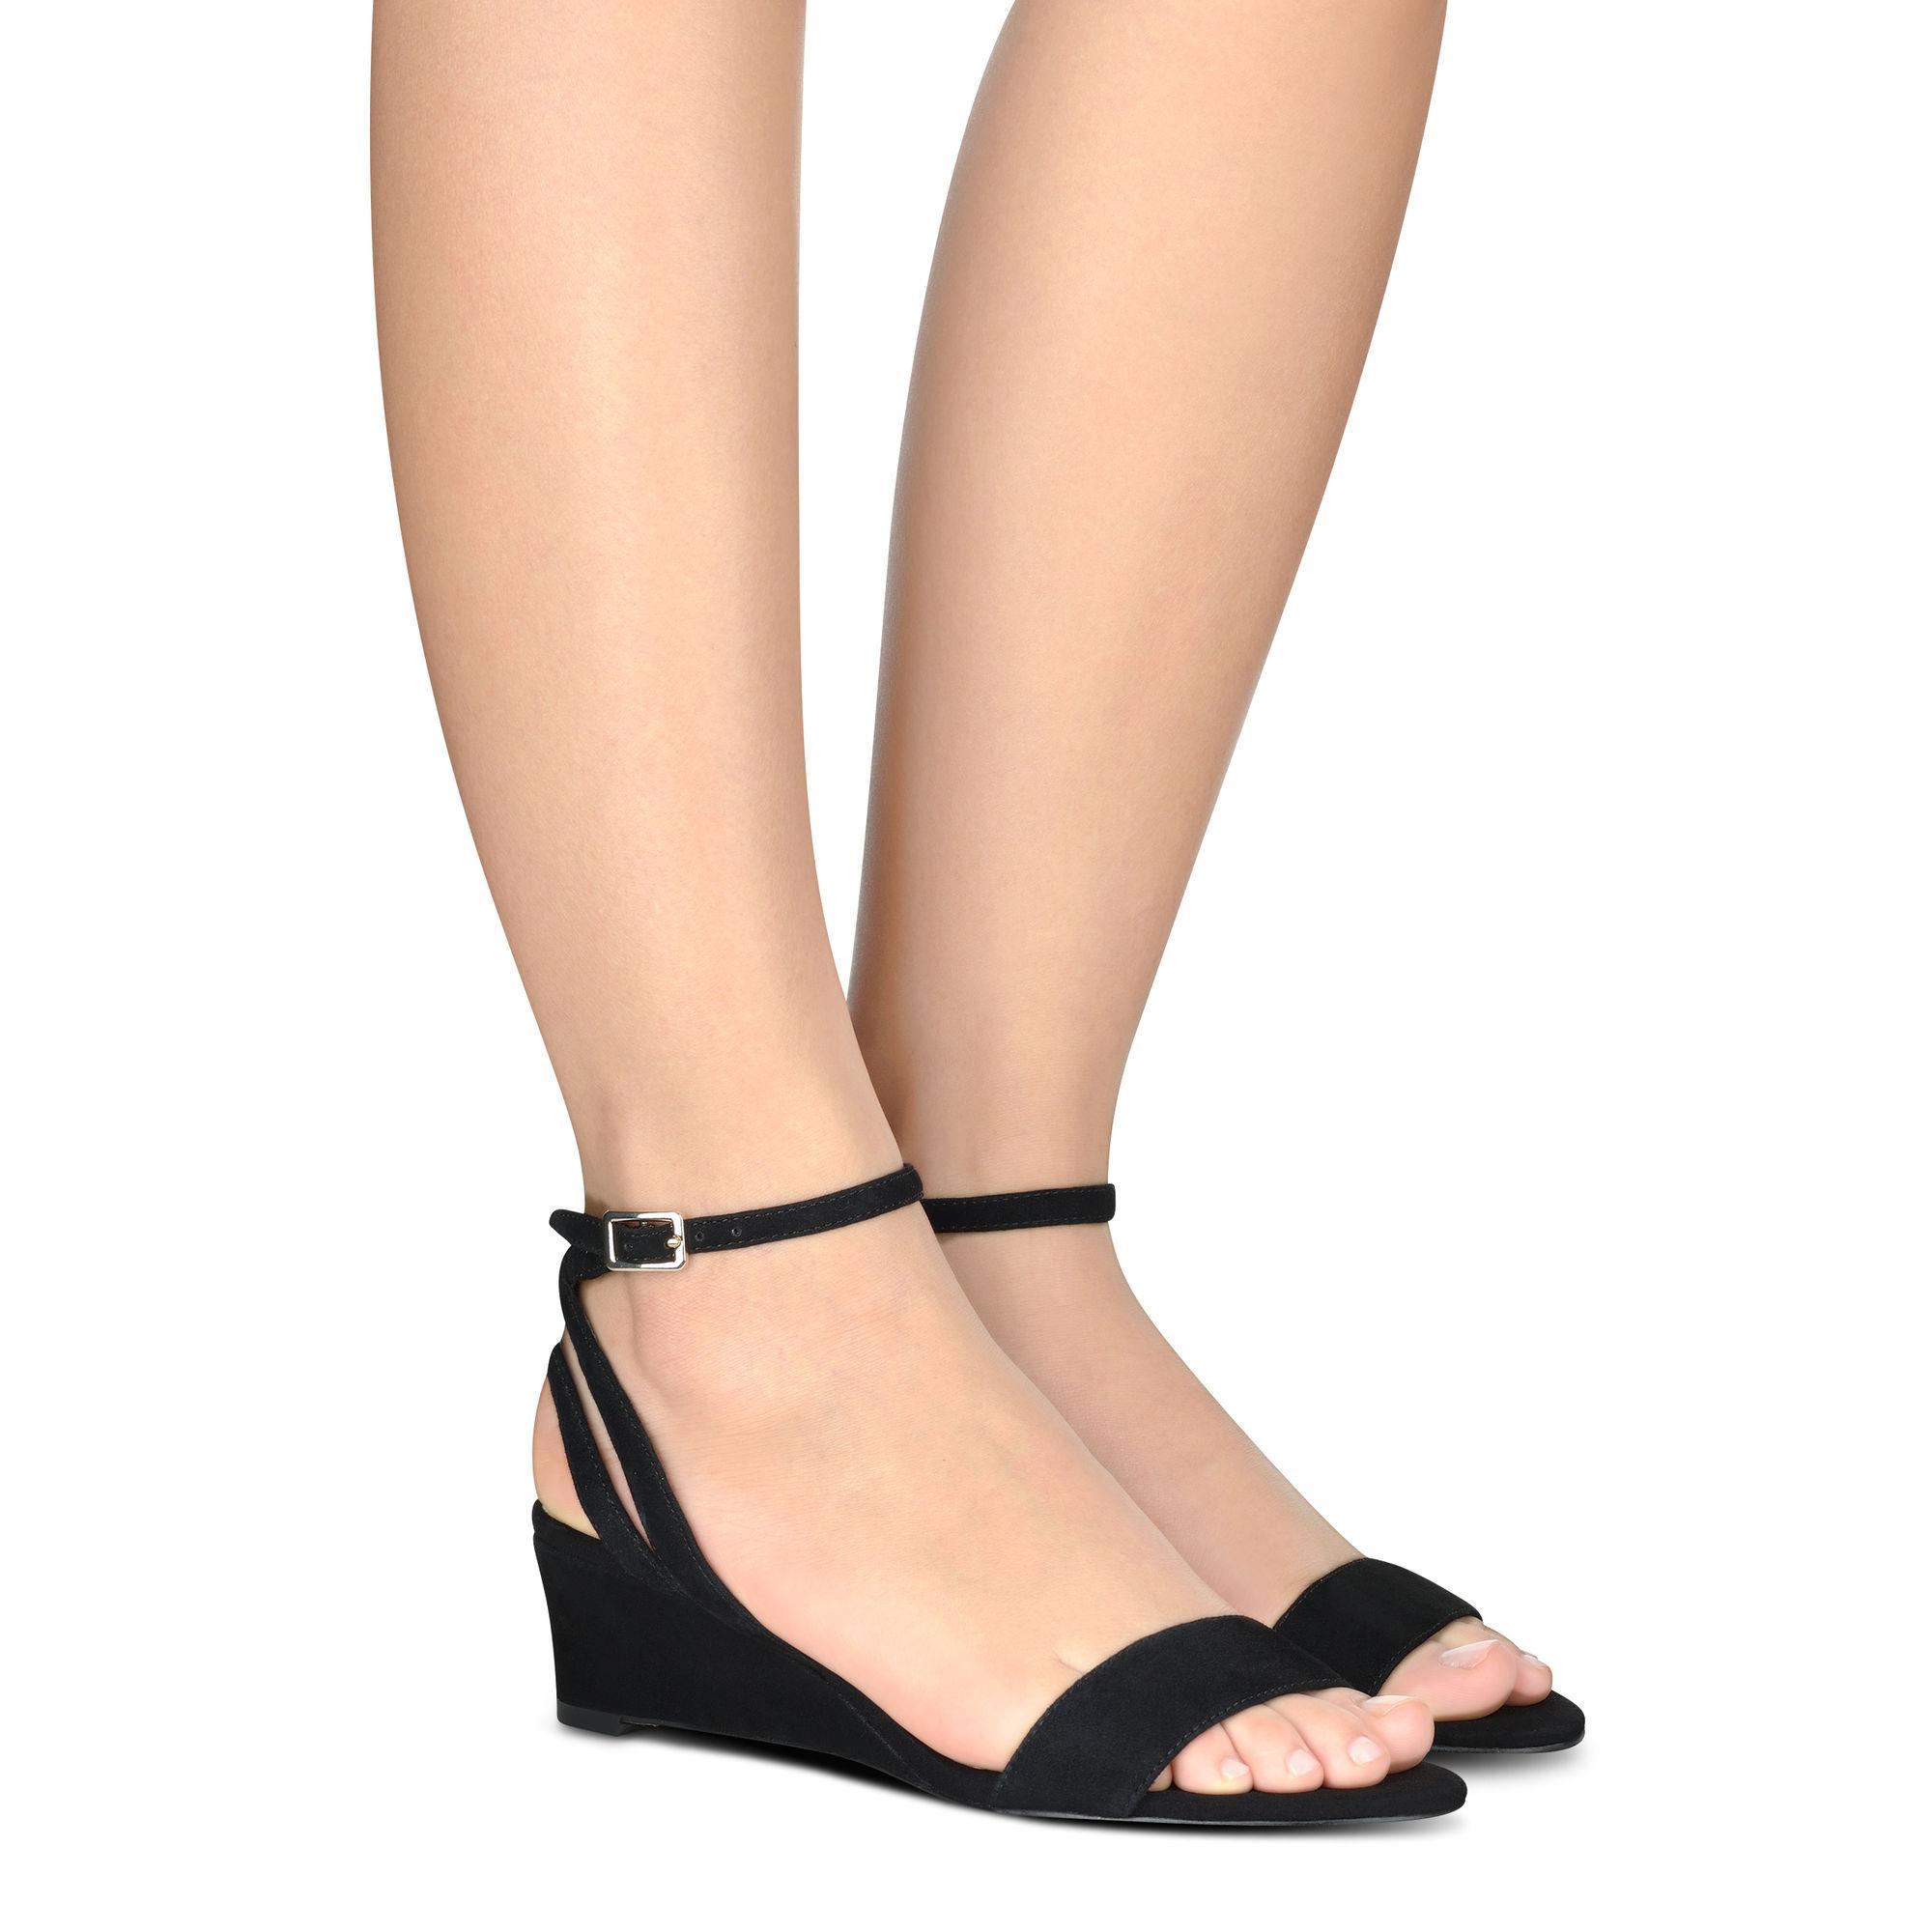 Nine West Shoes Black Heels